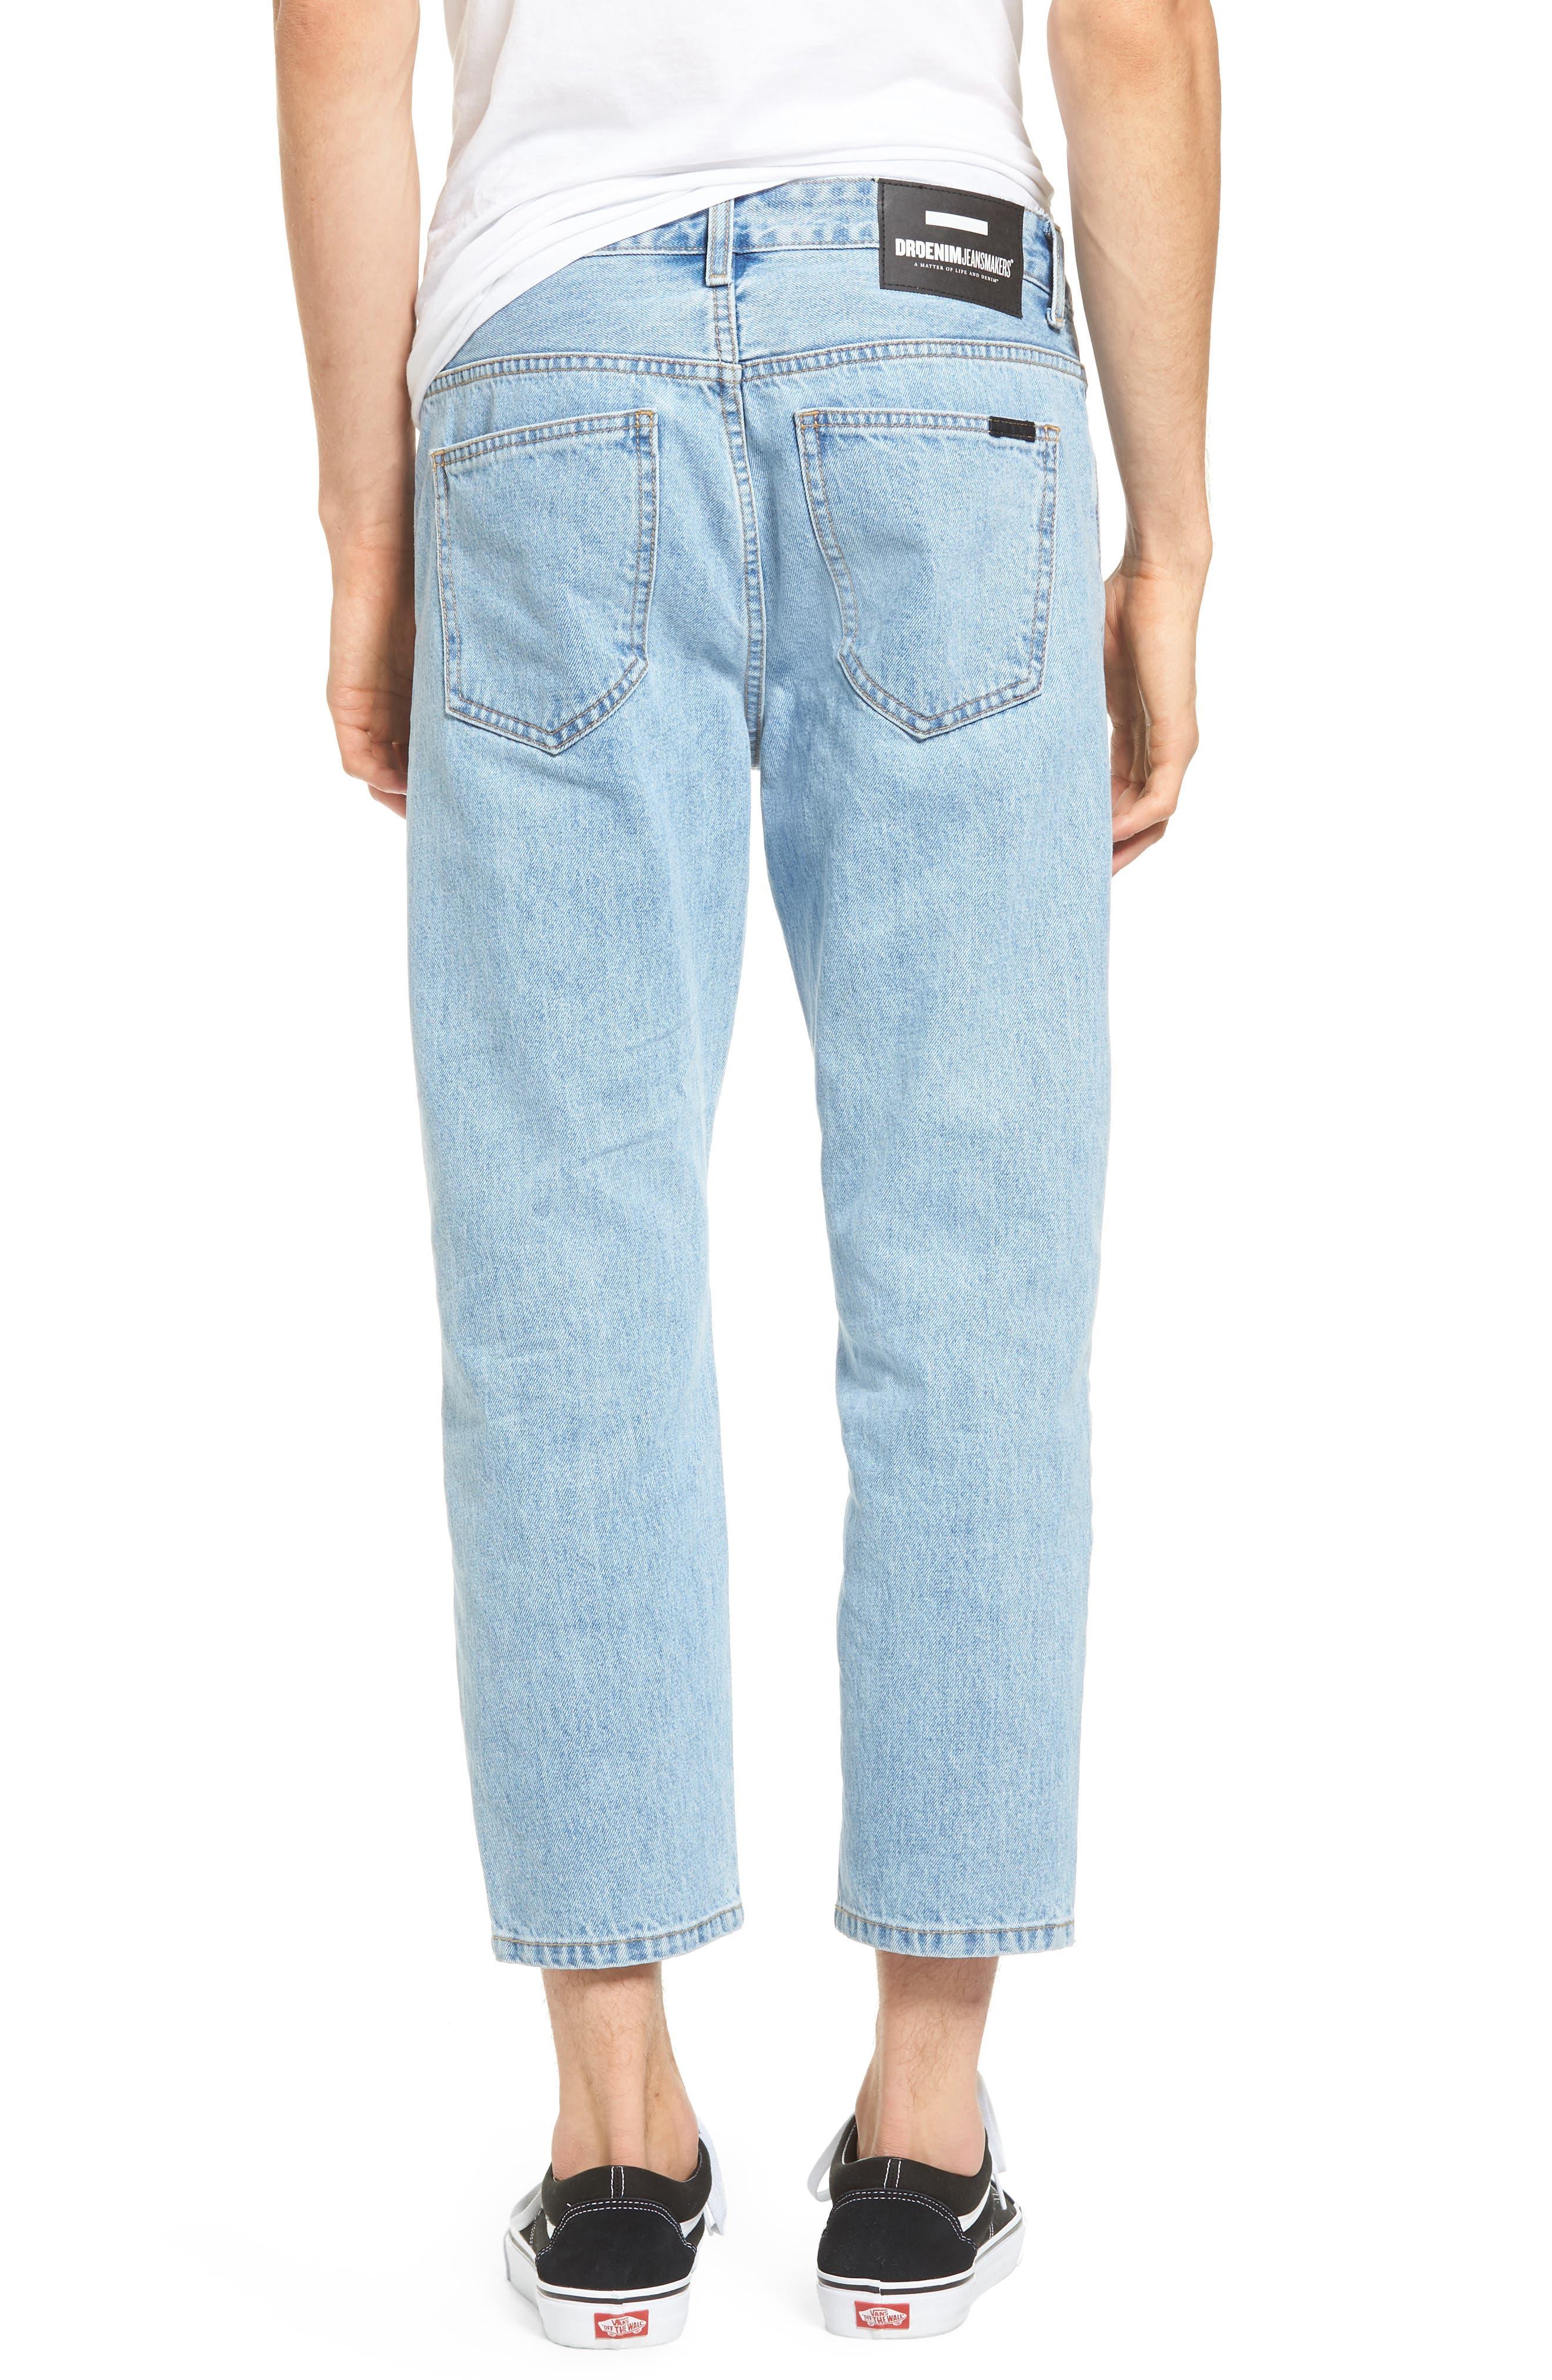 Otis Straight Fit Jeans,                             Alternate thumbnail 2, color,                             400